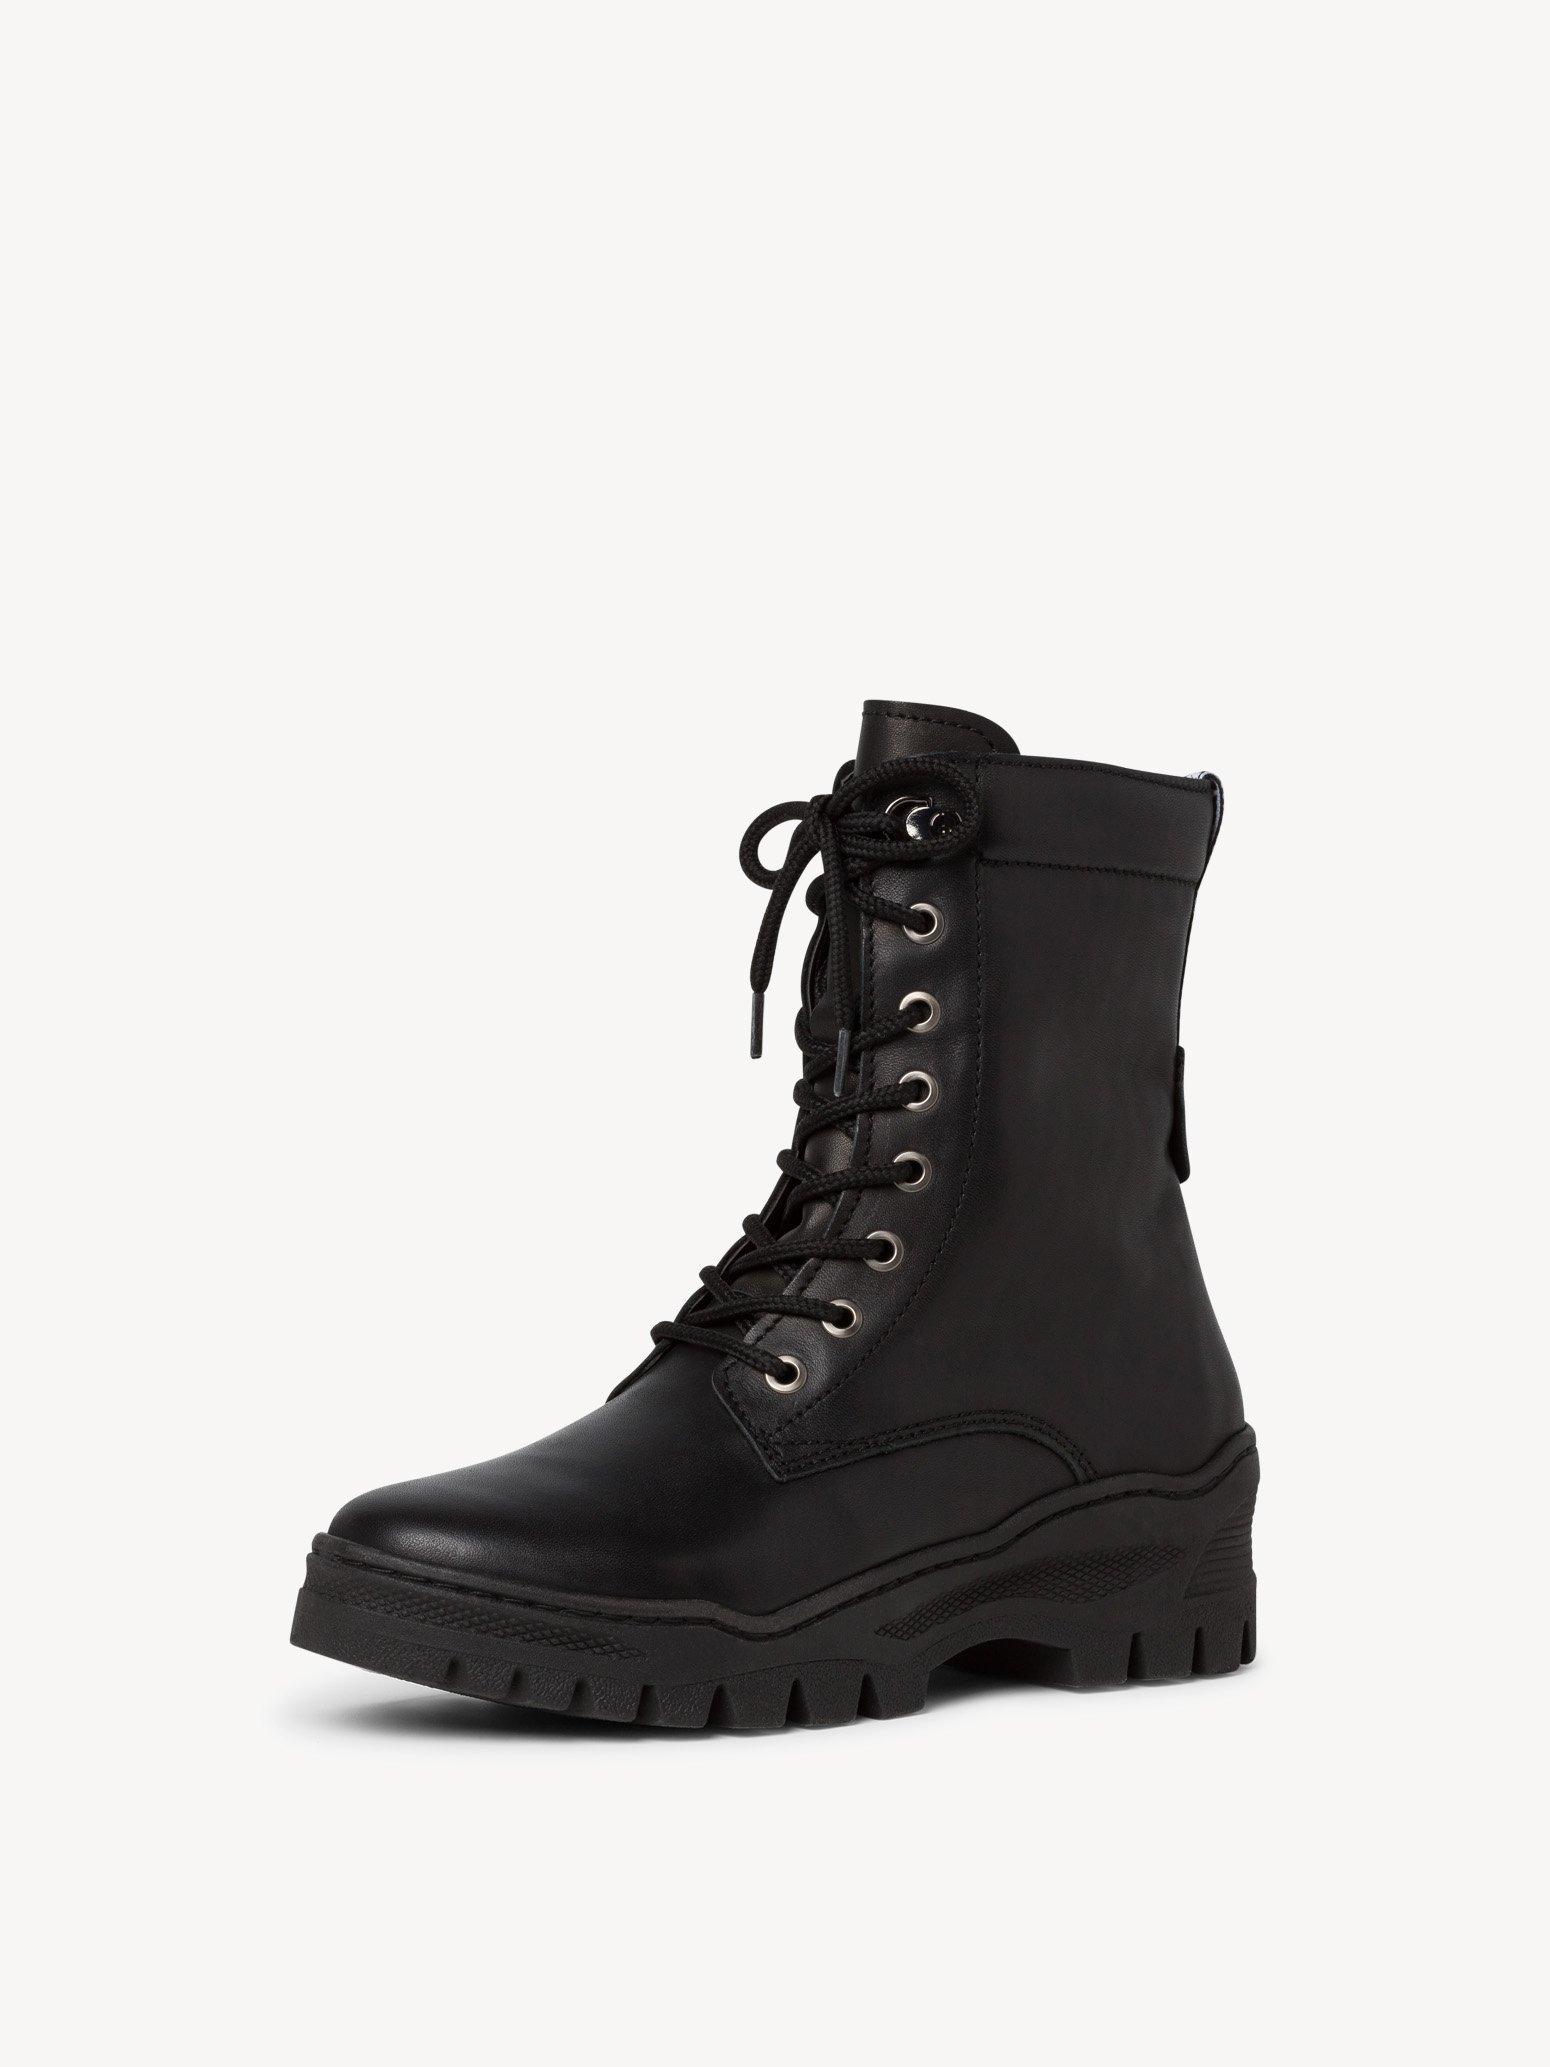 Ботинки Tamaris 1-1-26261-25-001